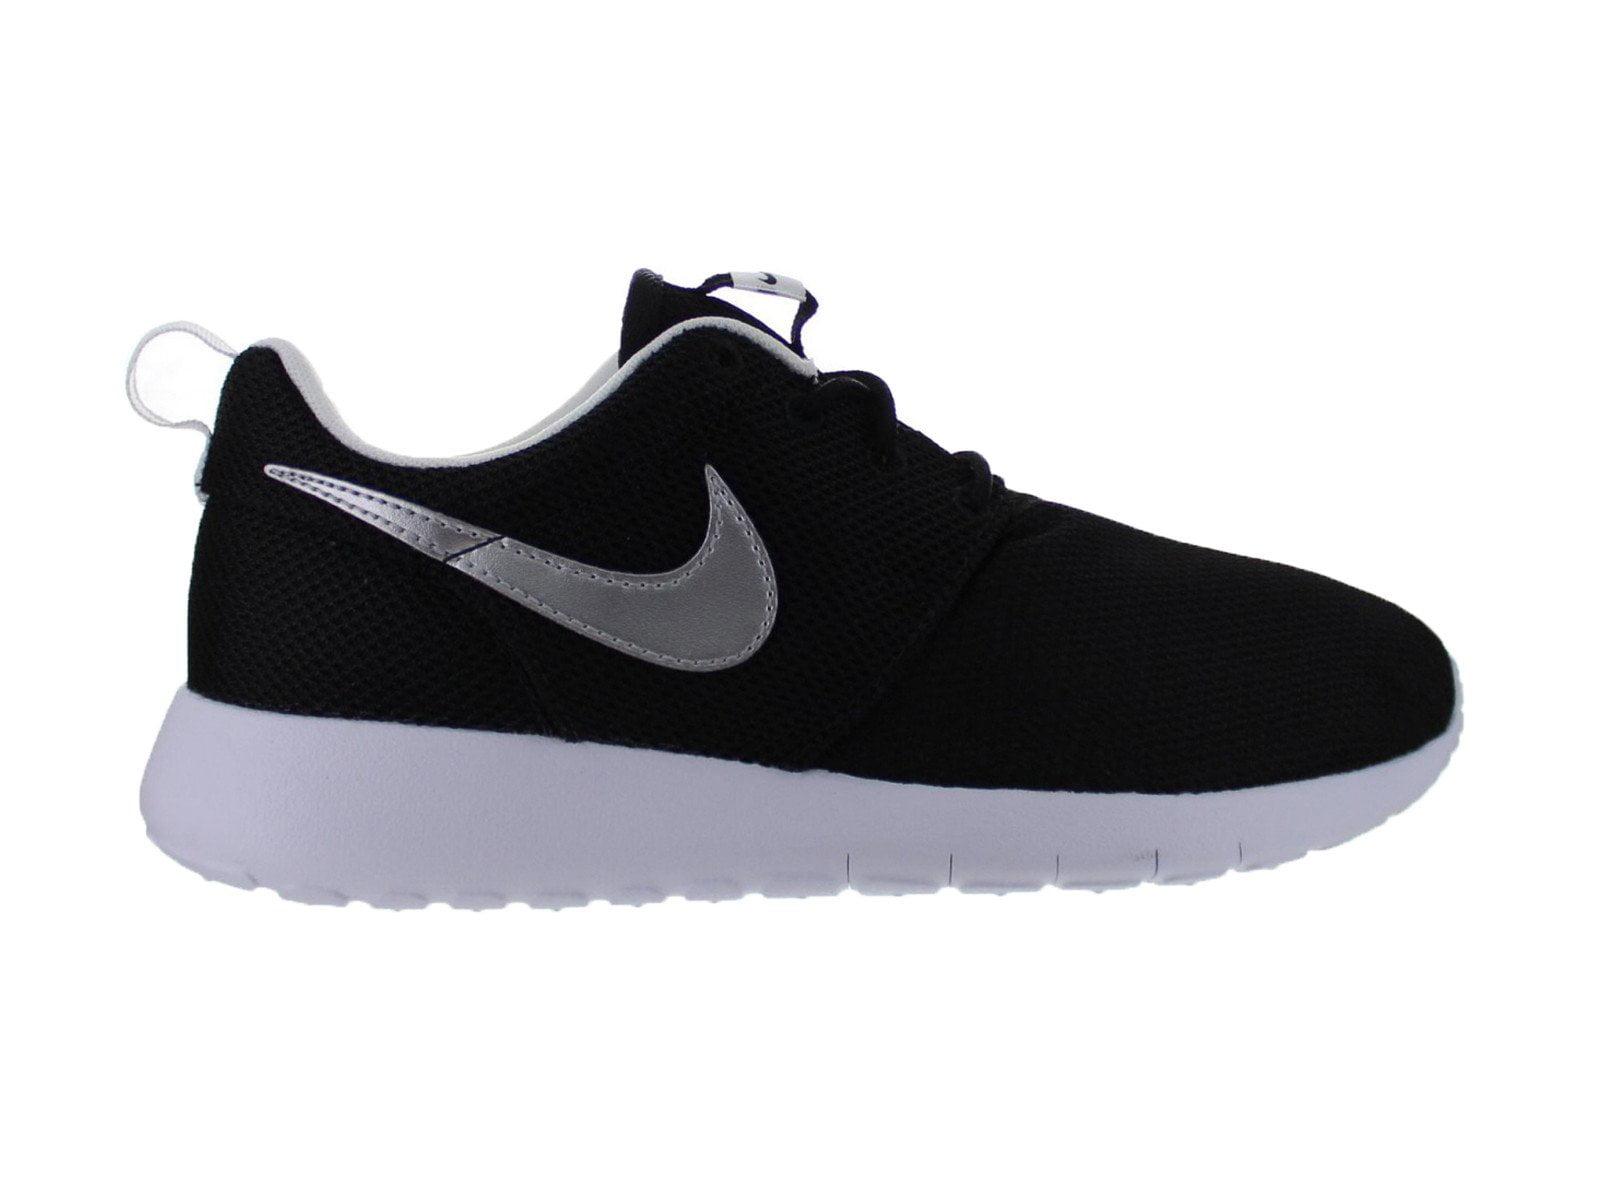 Nike Roshe One GS Black Metallic Silver